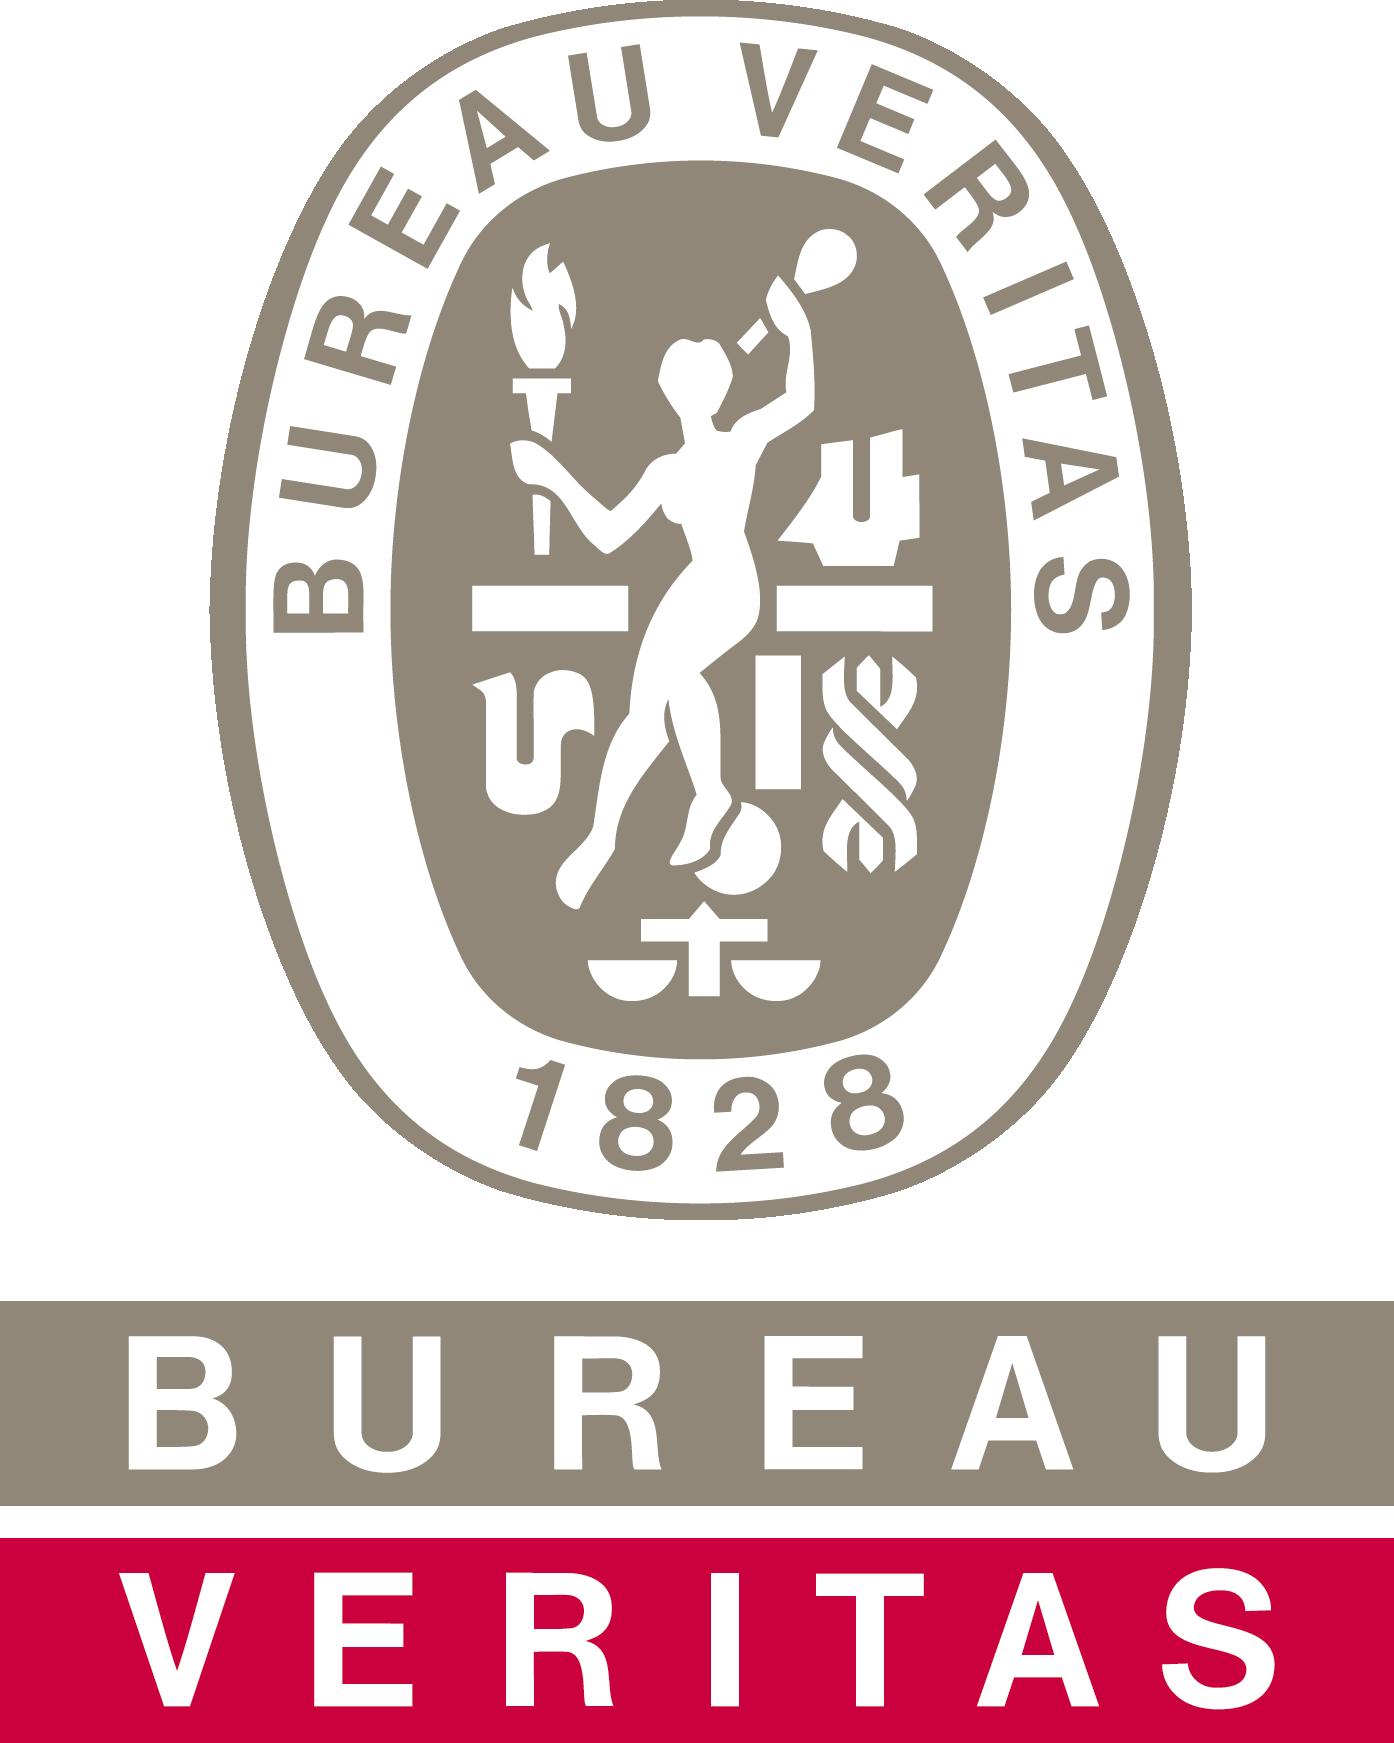 Bureau Veritas logo Enlit Europe episode